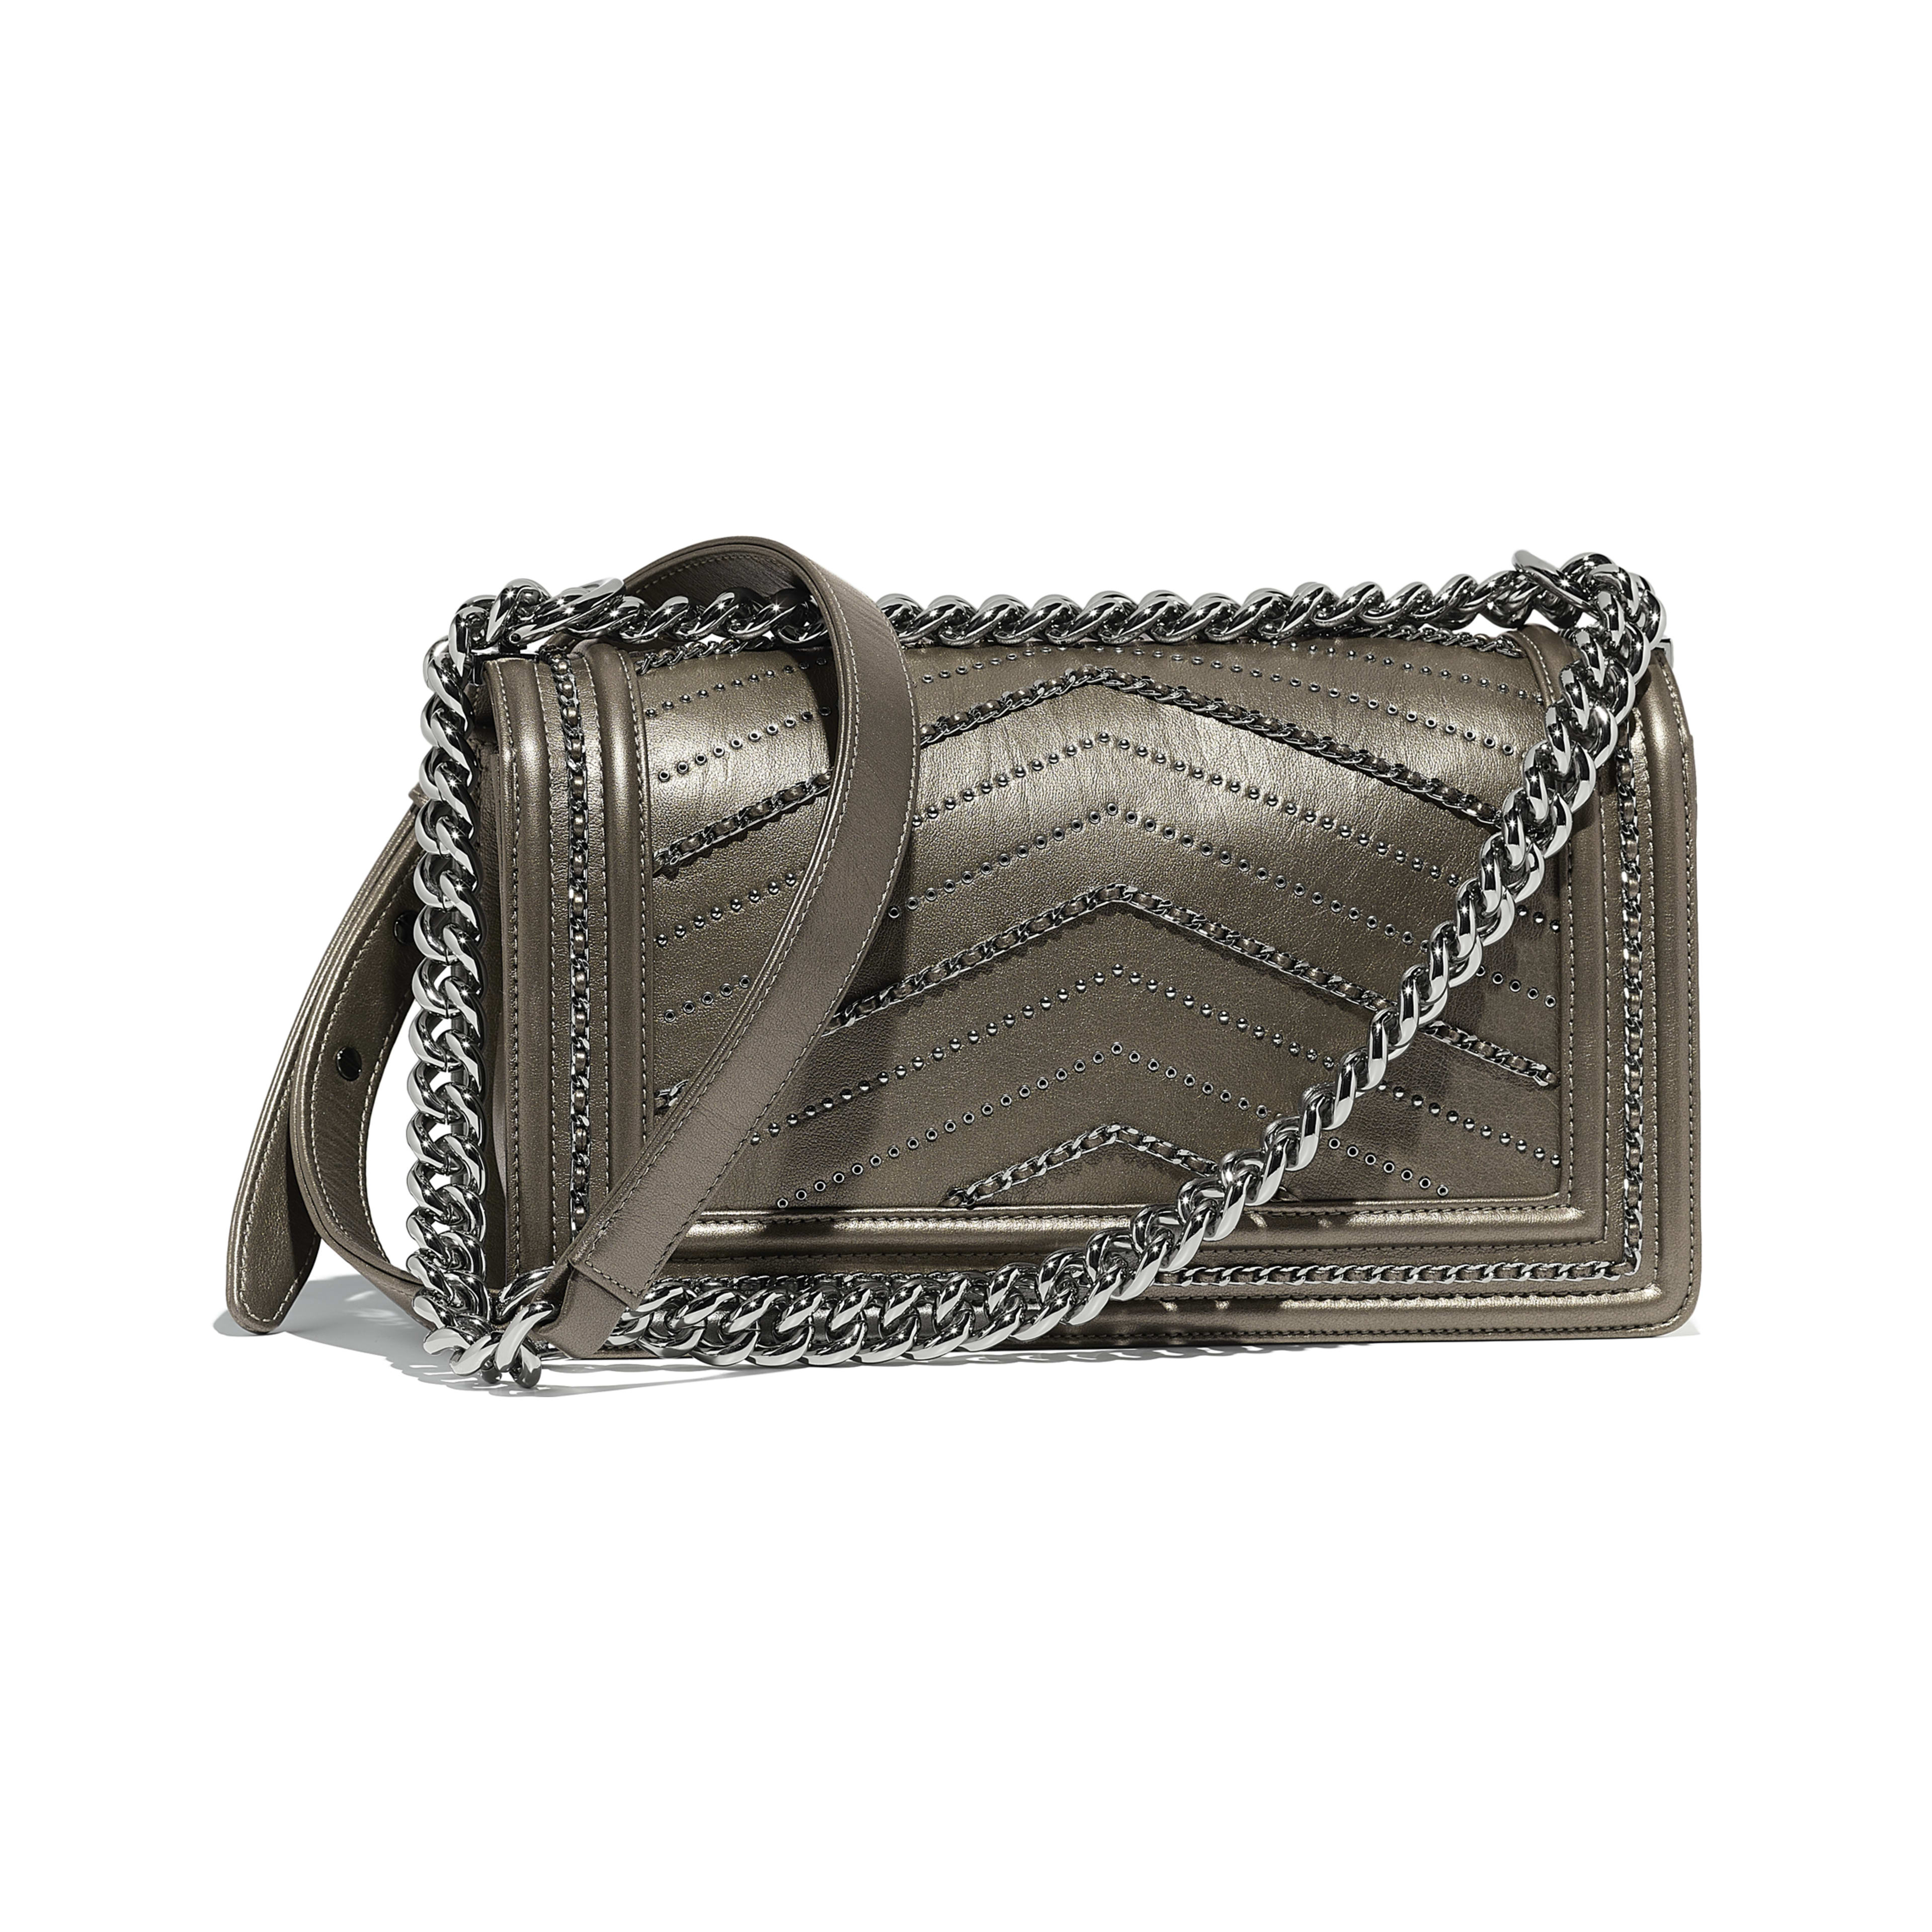 BOY CHANEL Handbag Metallic Crumpled Calfskin & Ruthenium-Finish Metal Silver -                                       view 2 - see full sized version